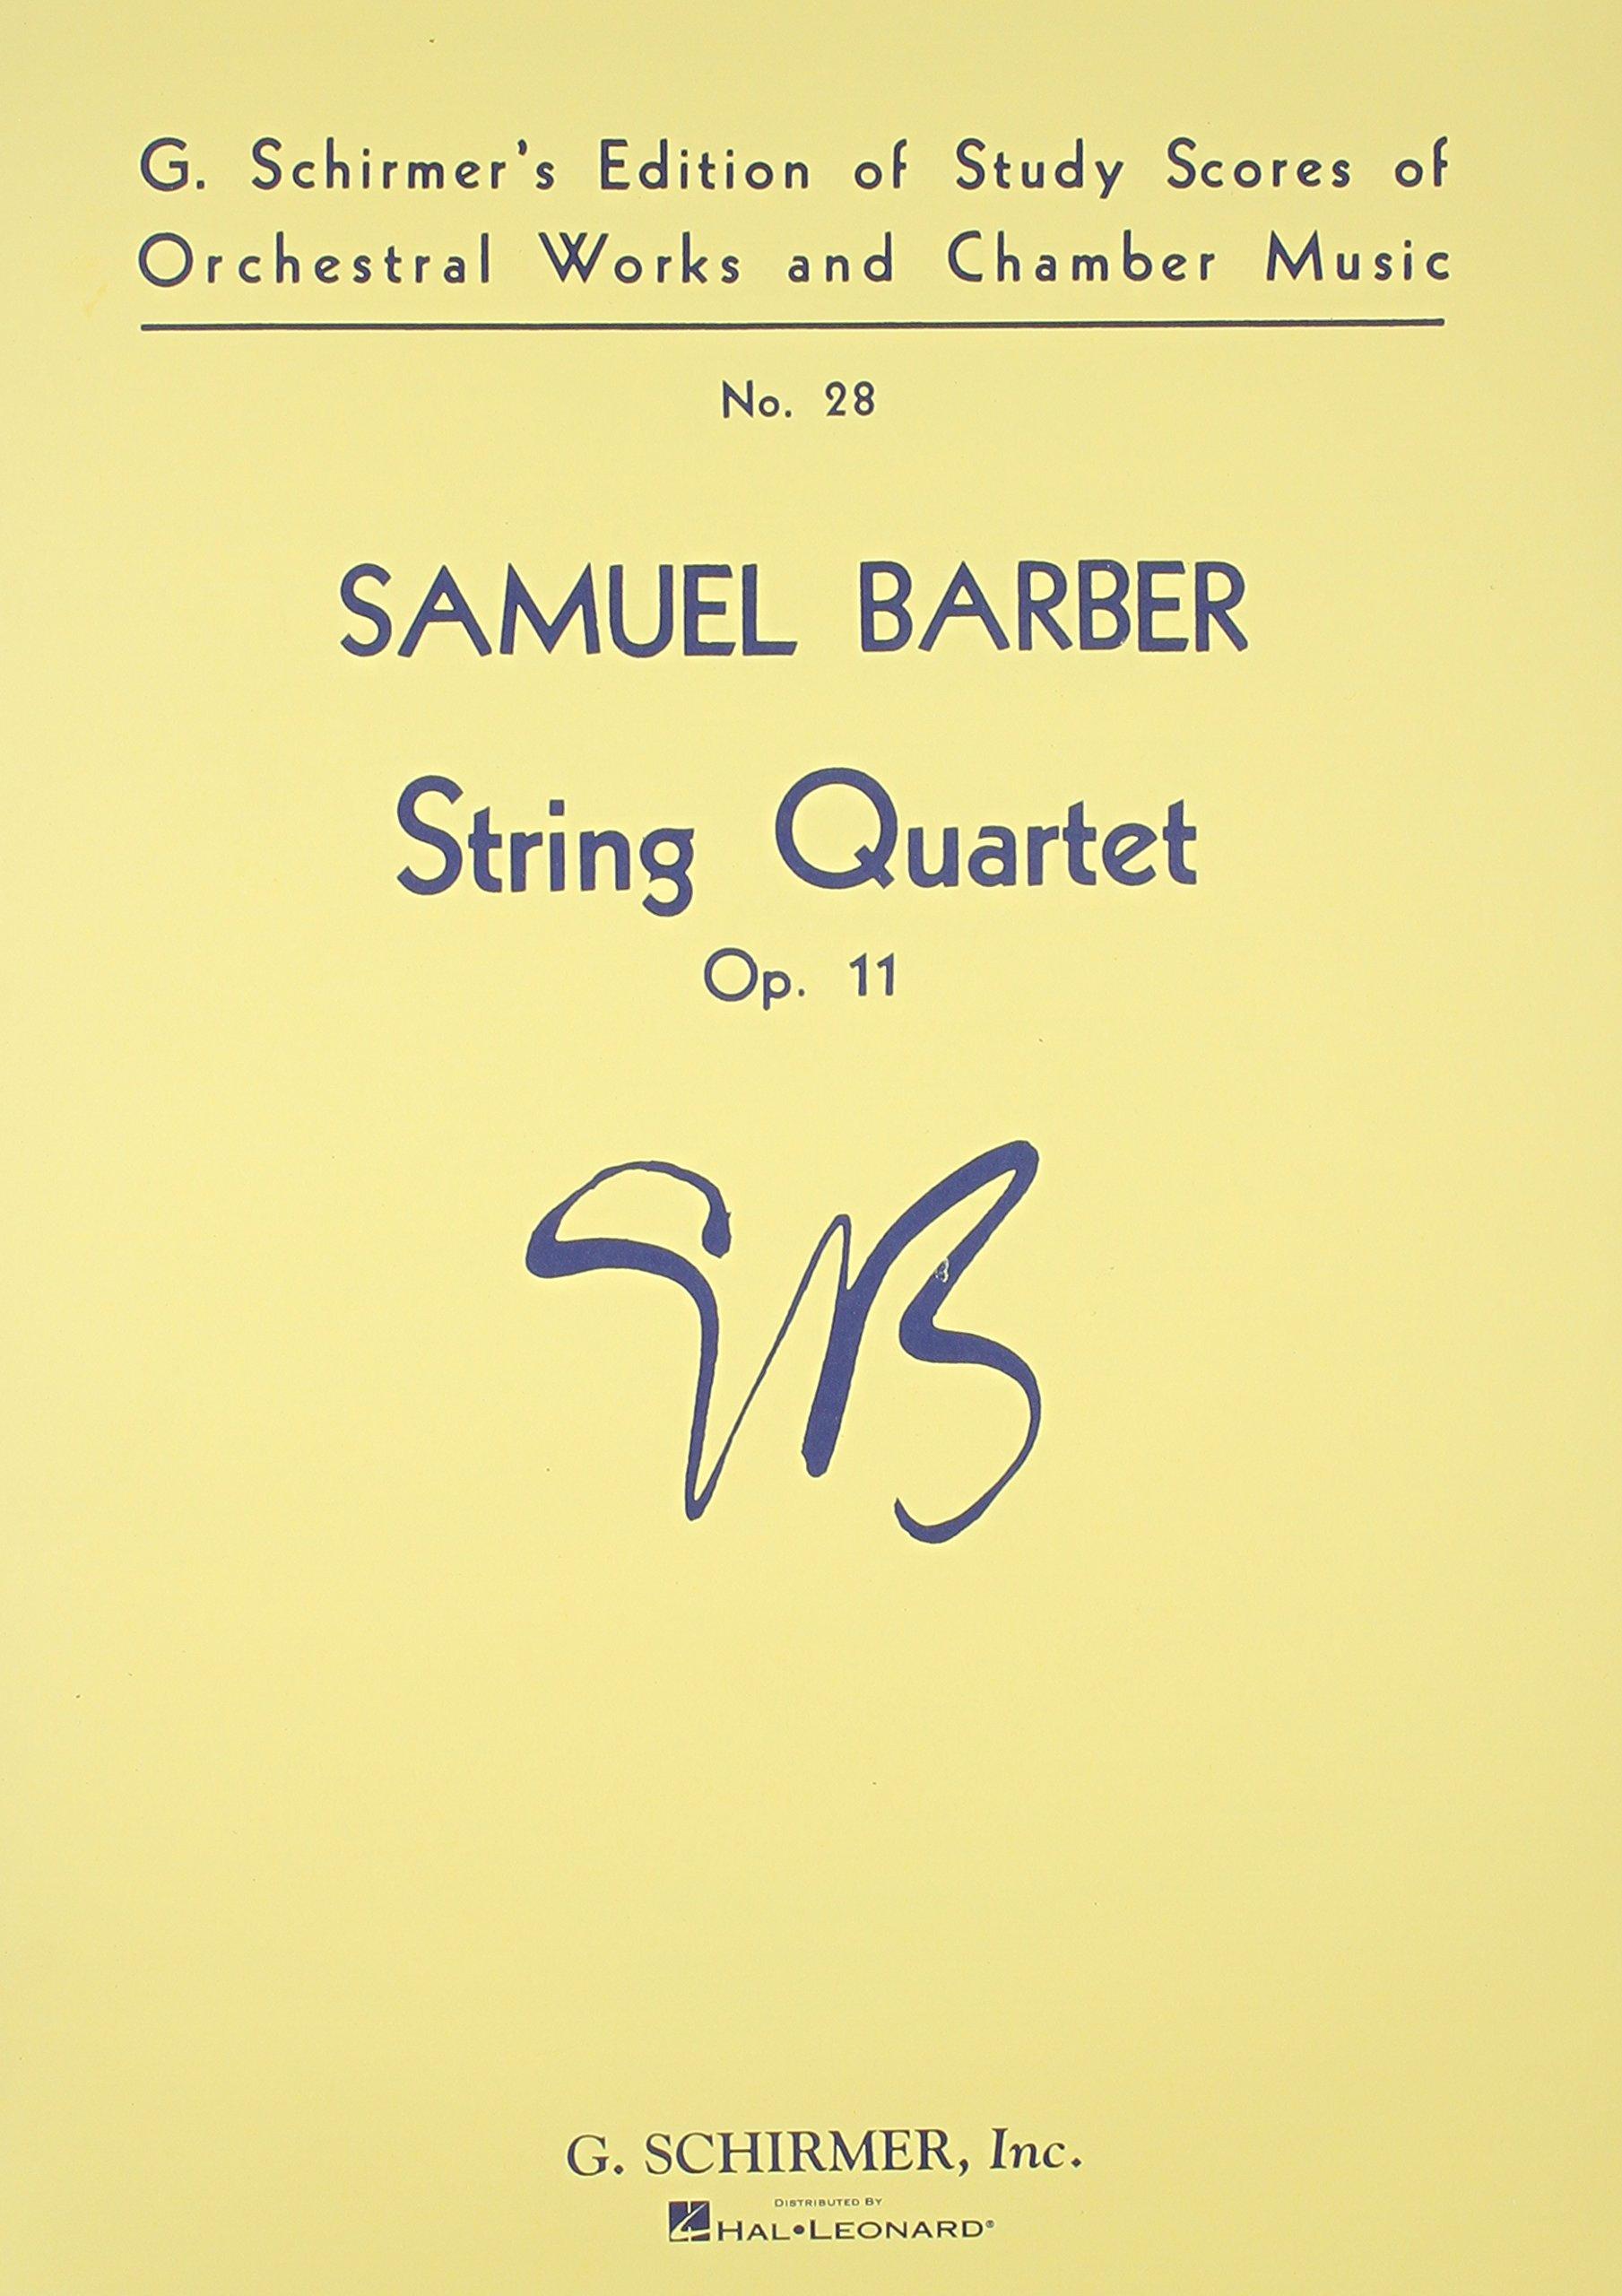 String Quartet, Op. 11: Study Score No. 28